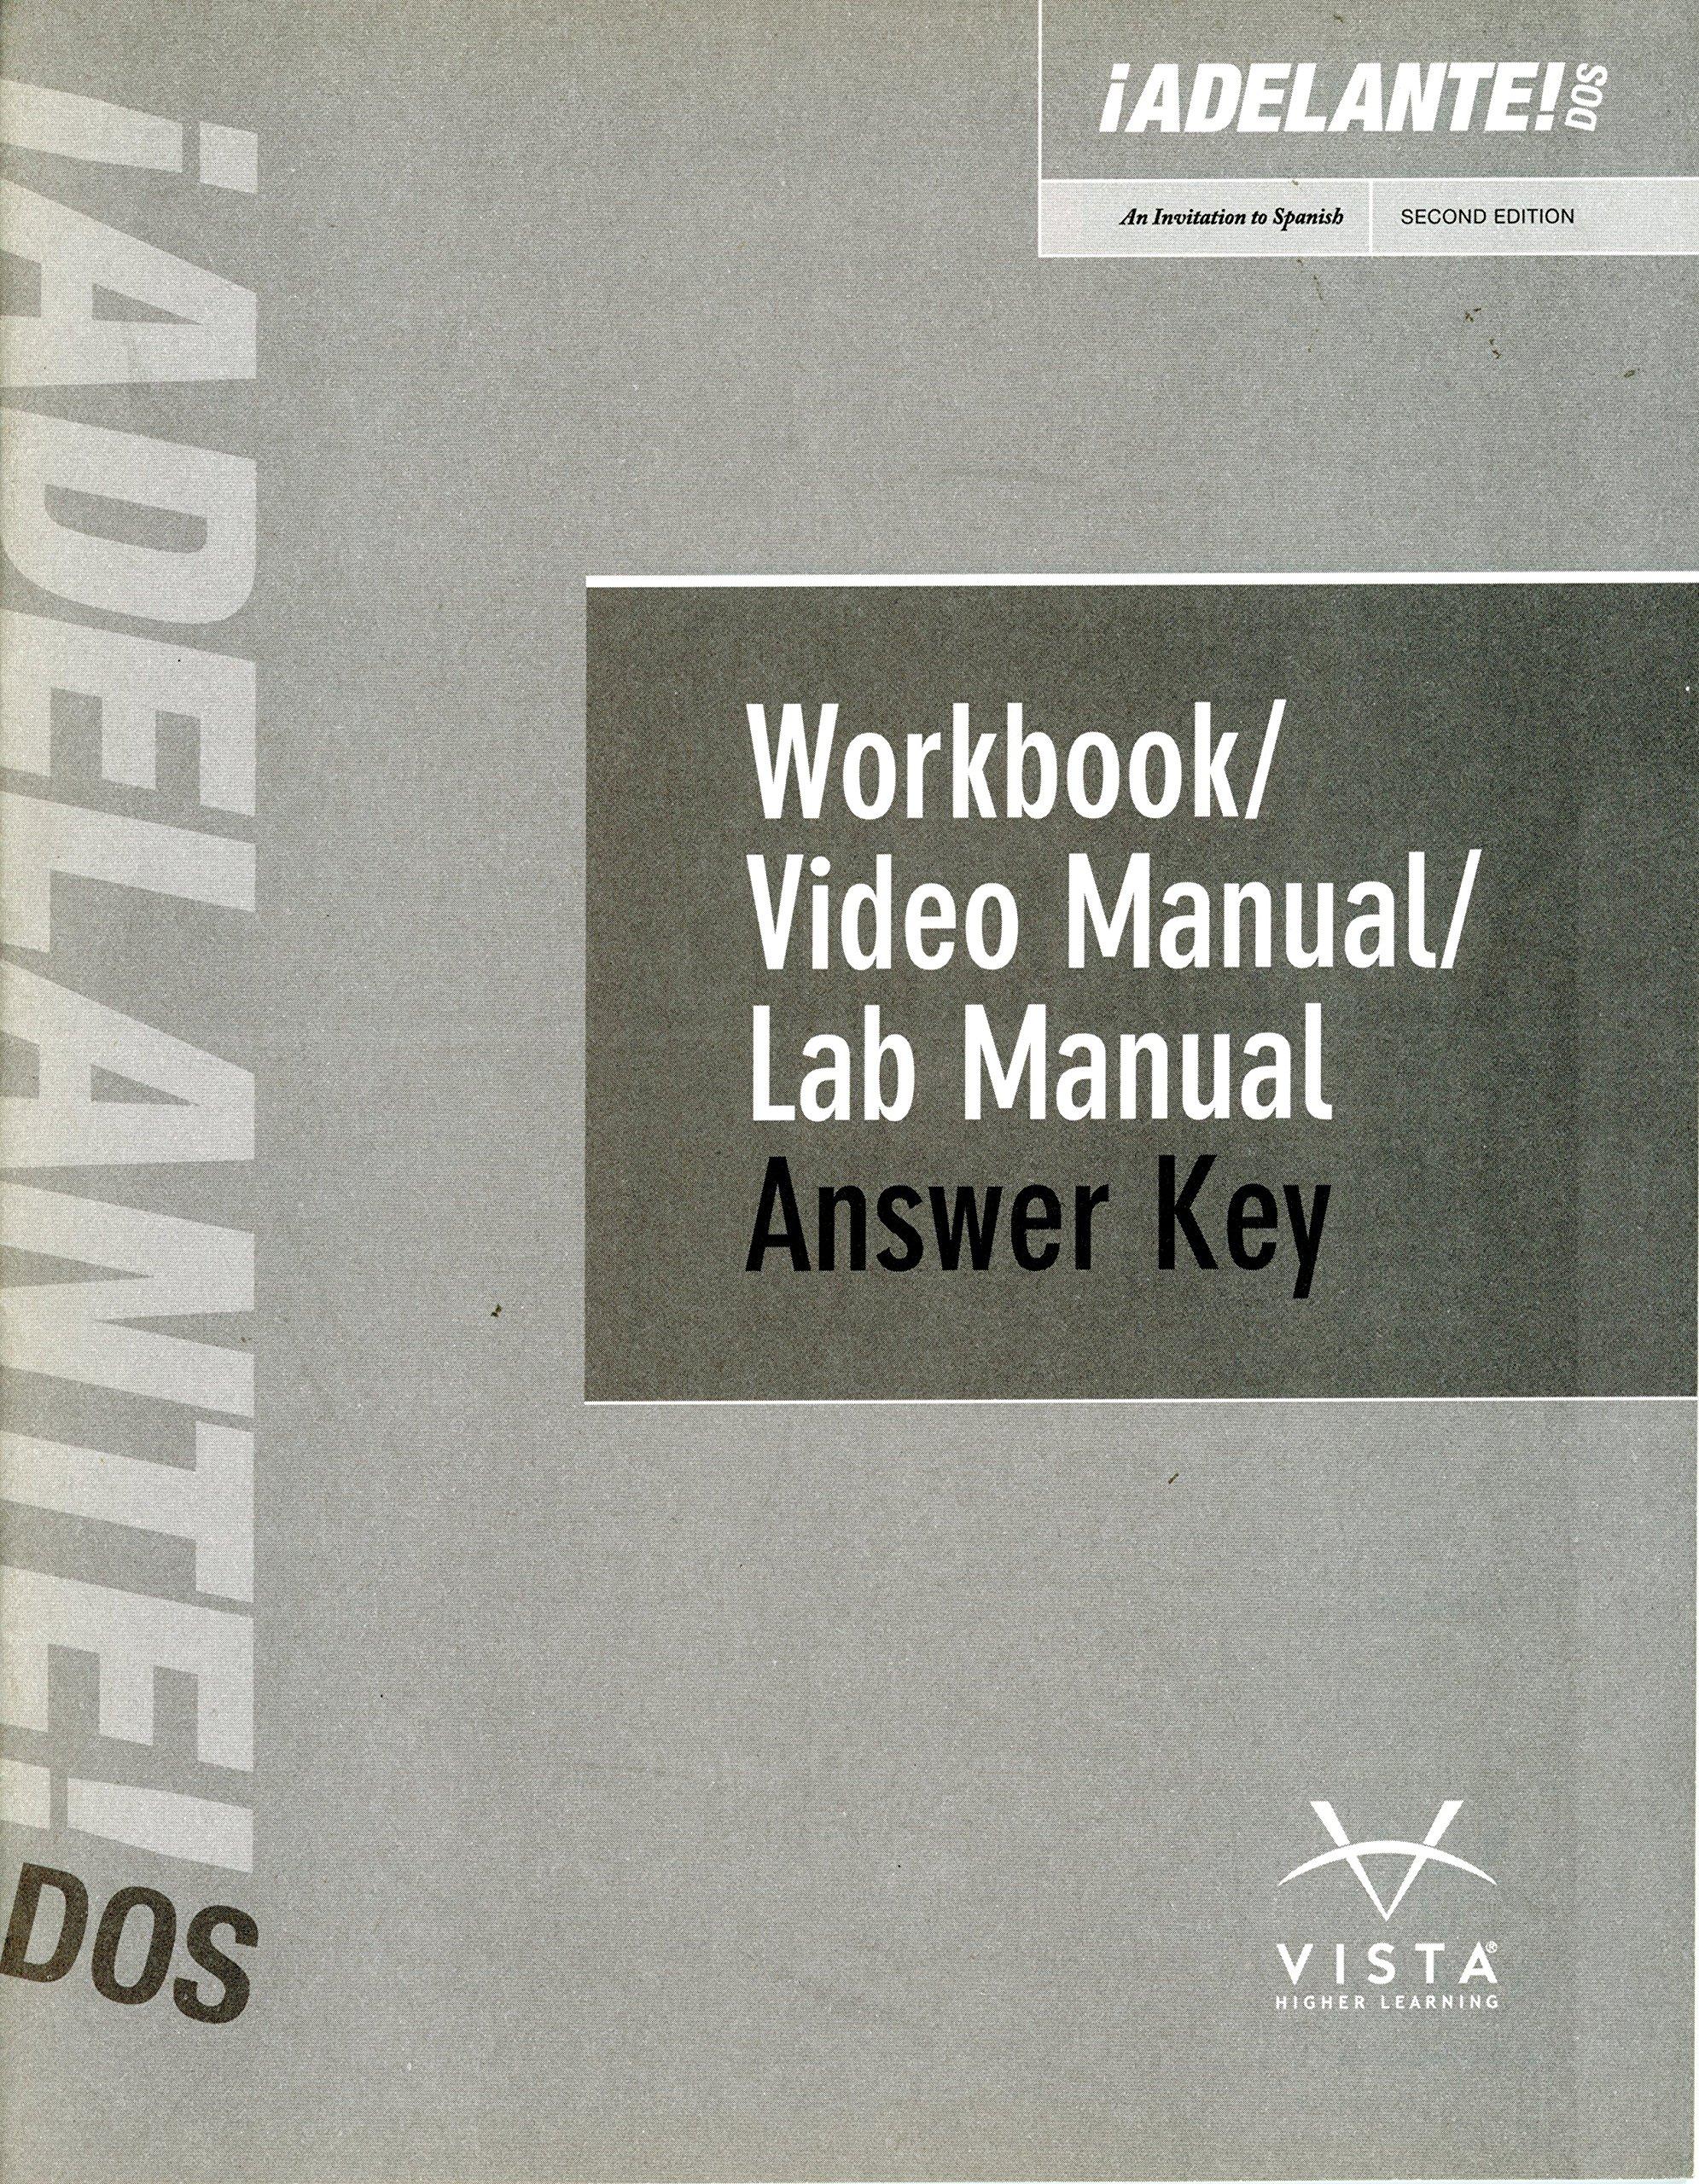 adelante dos 2nd edition answer key vhl 9781618579027 amazon com rh amazon com Dos 6.22 Manual PDF MS-DOS Manual PDF